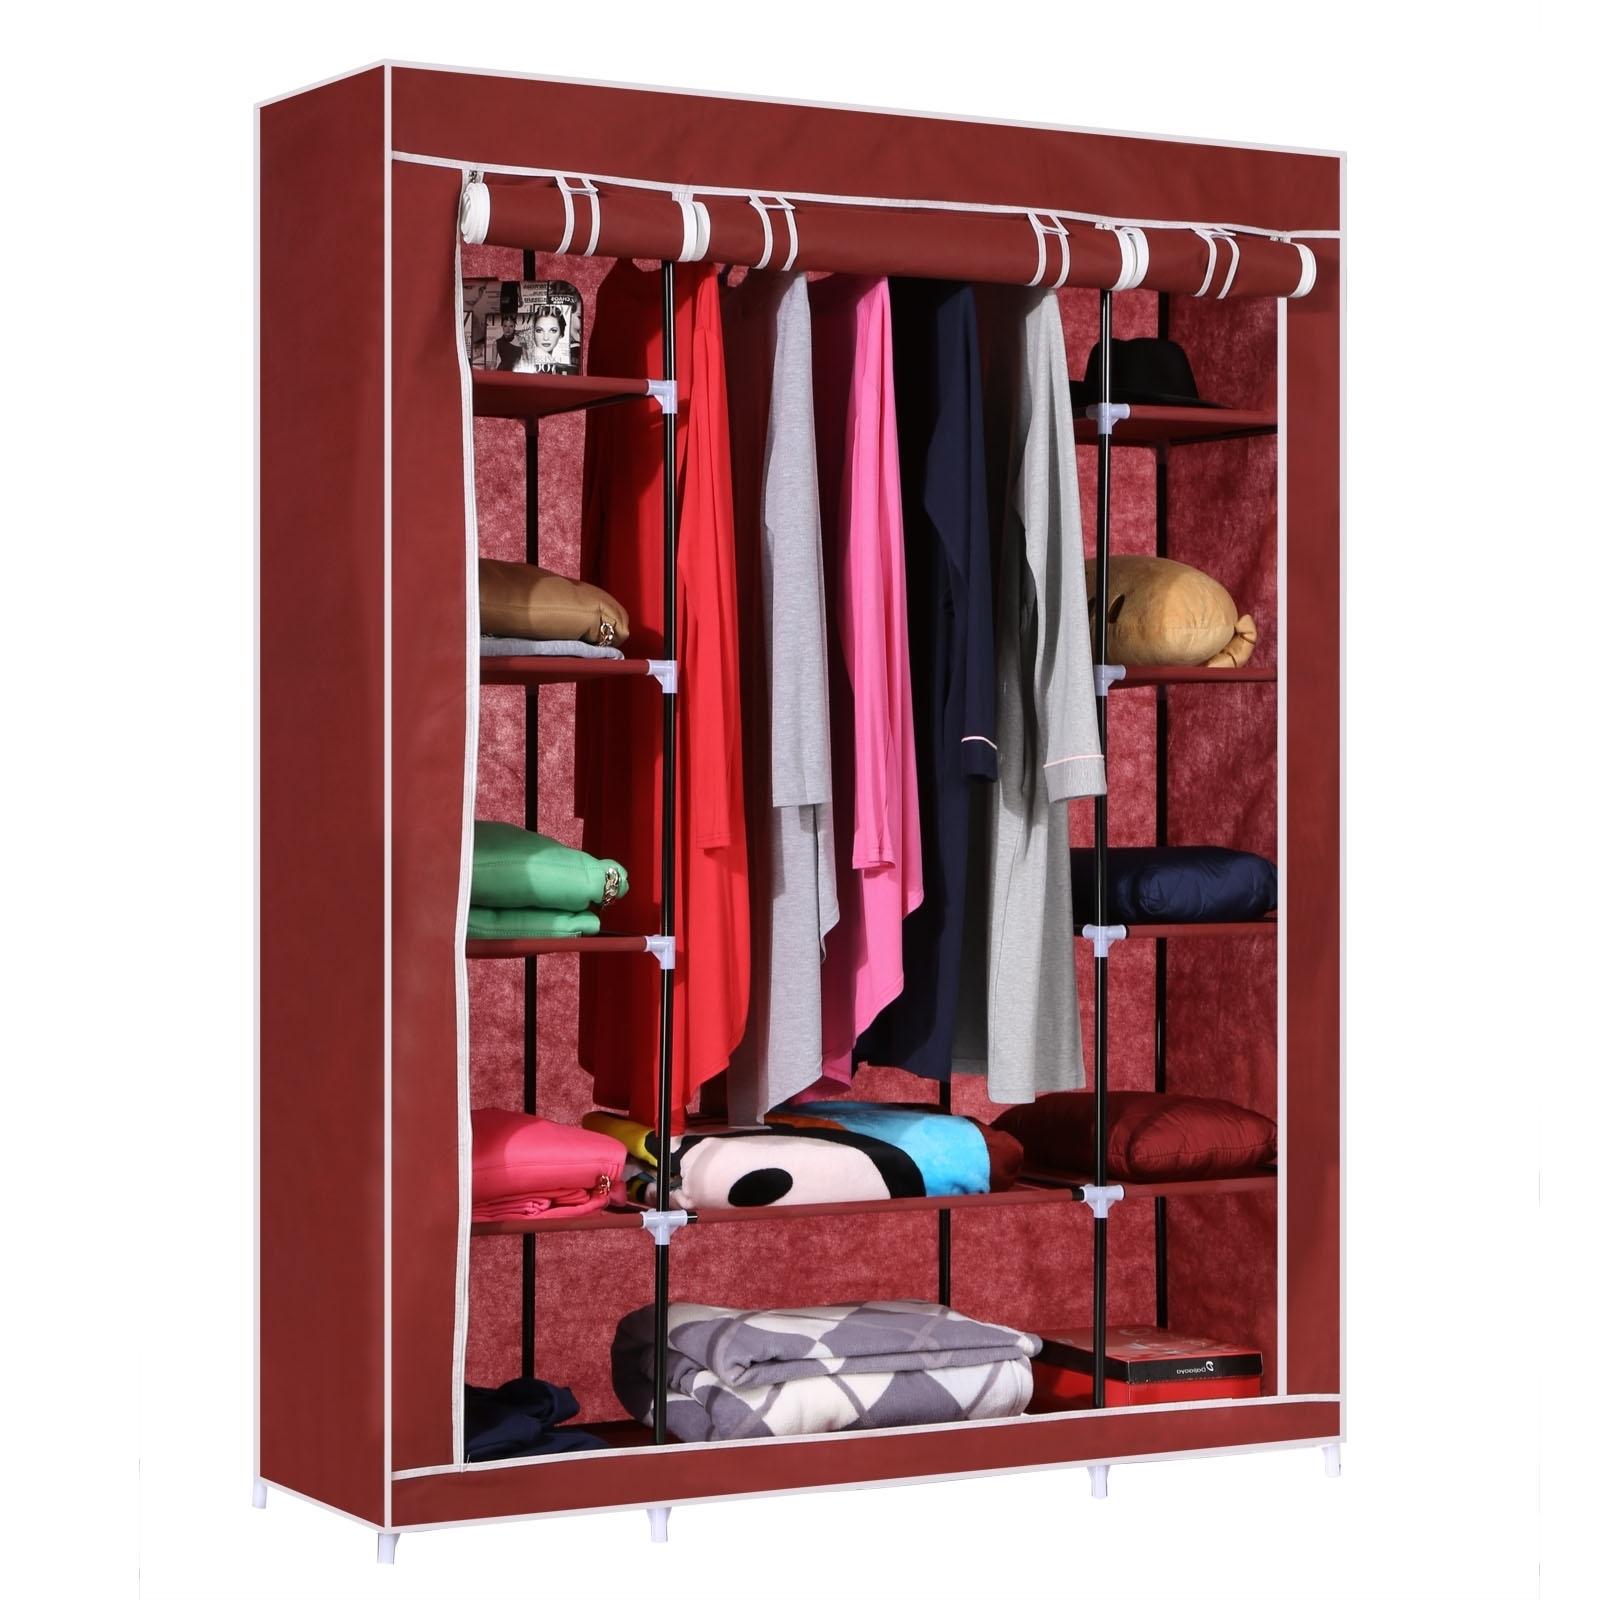 Homdox 52 Portable Closet Storage Organizer Wardrobe Clothes Intended For Portable Wardrobe Closet (View 24 of 27)